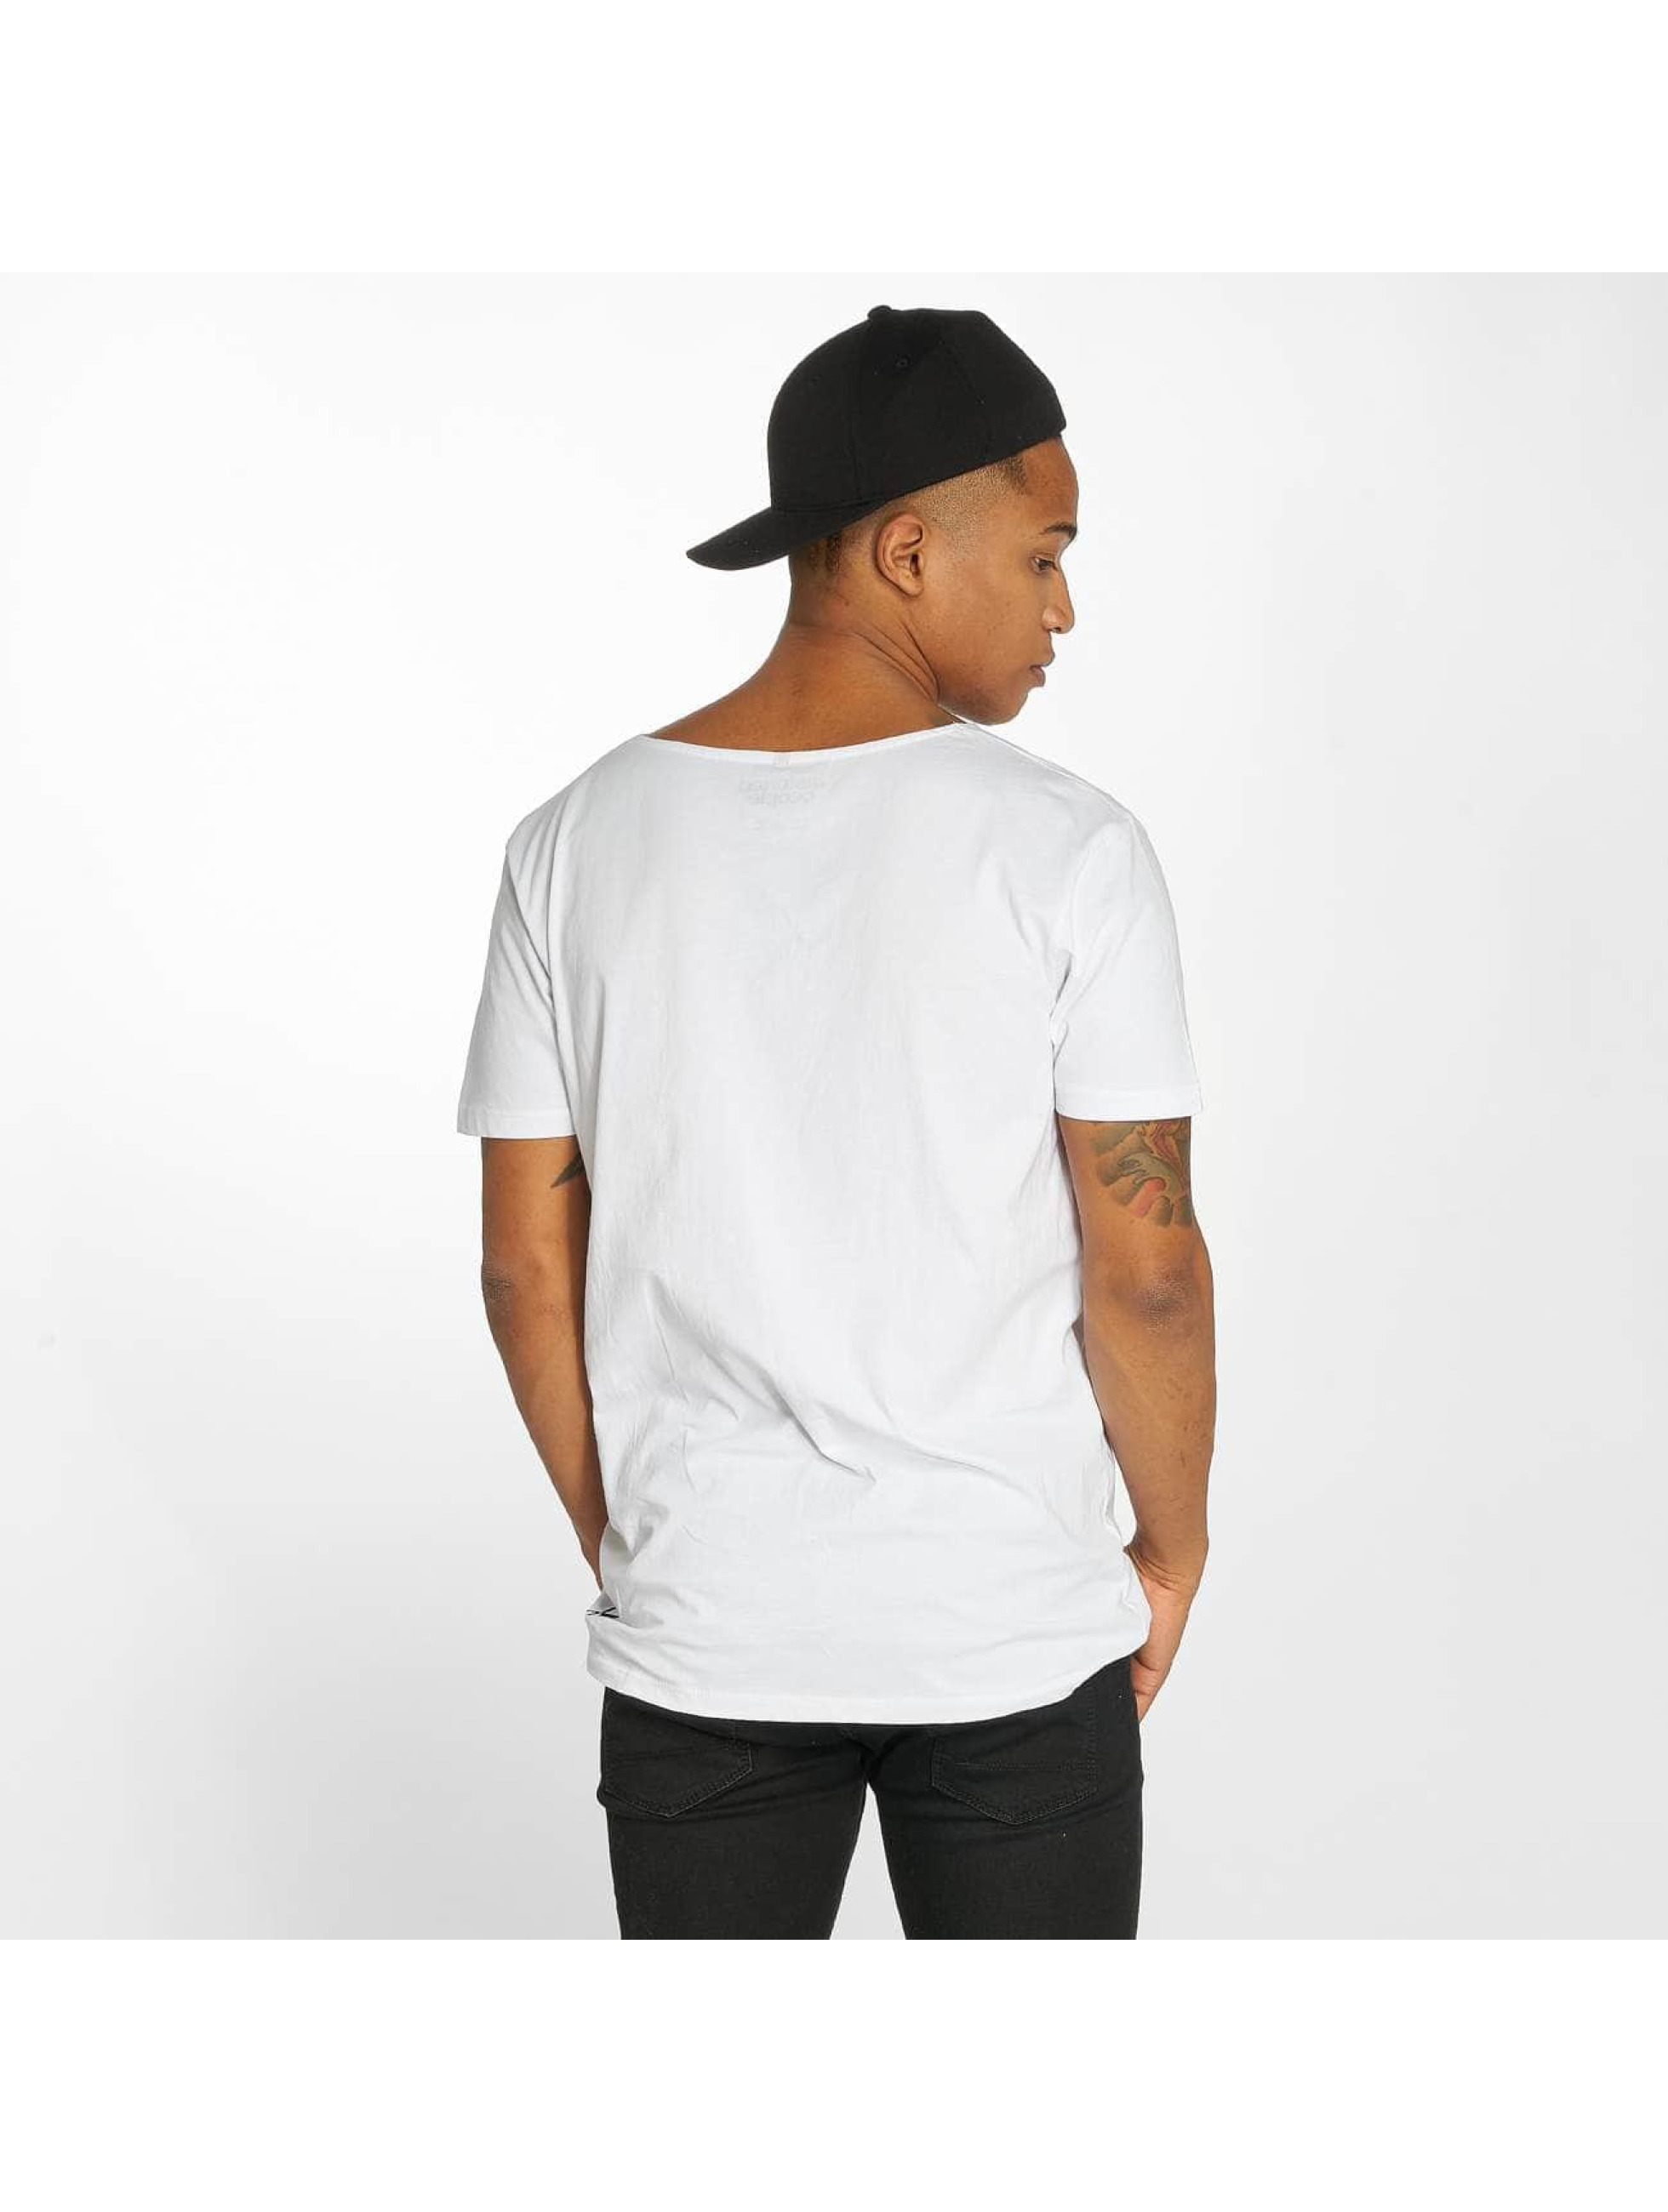 Distorted People Camiseta Barber & Butcher blanco